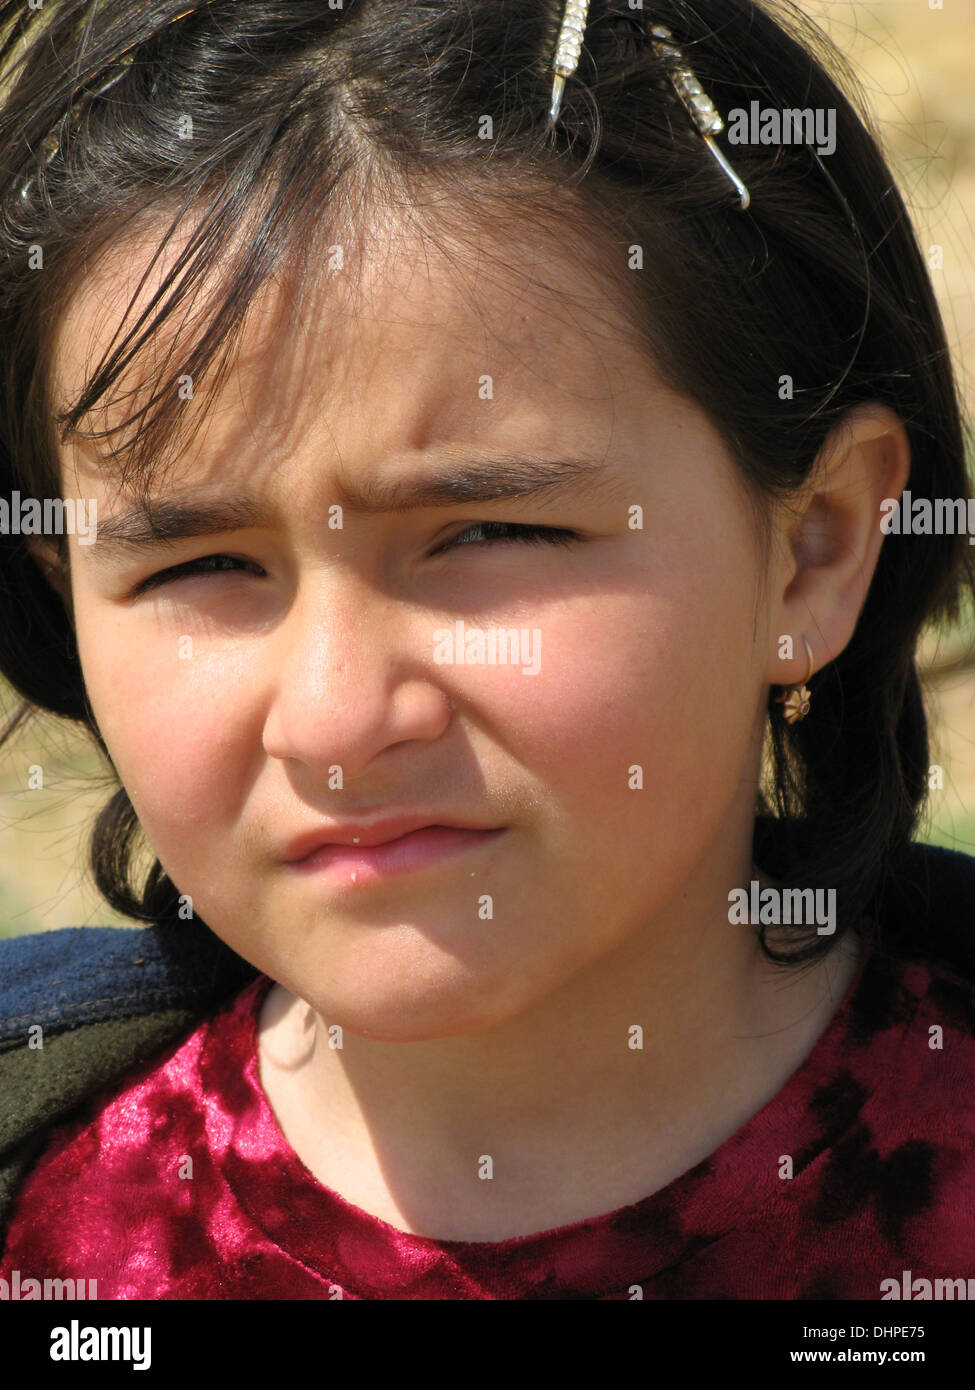 Ragazza tradizionale in Samarcanda, Uzbekistan Immagini Stock